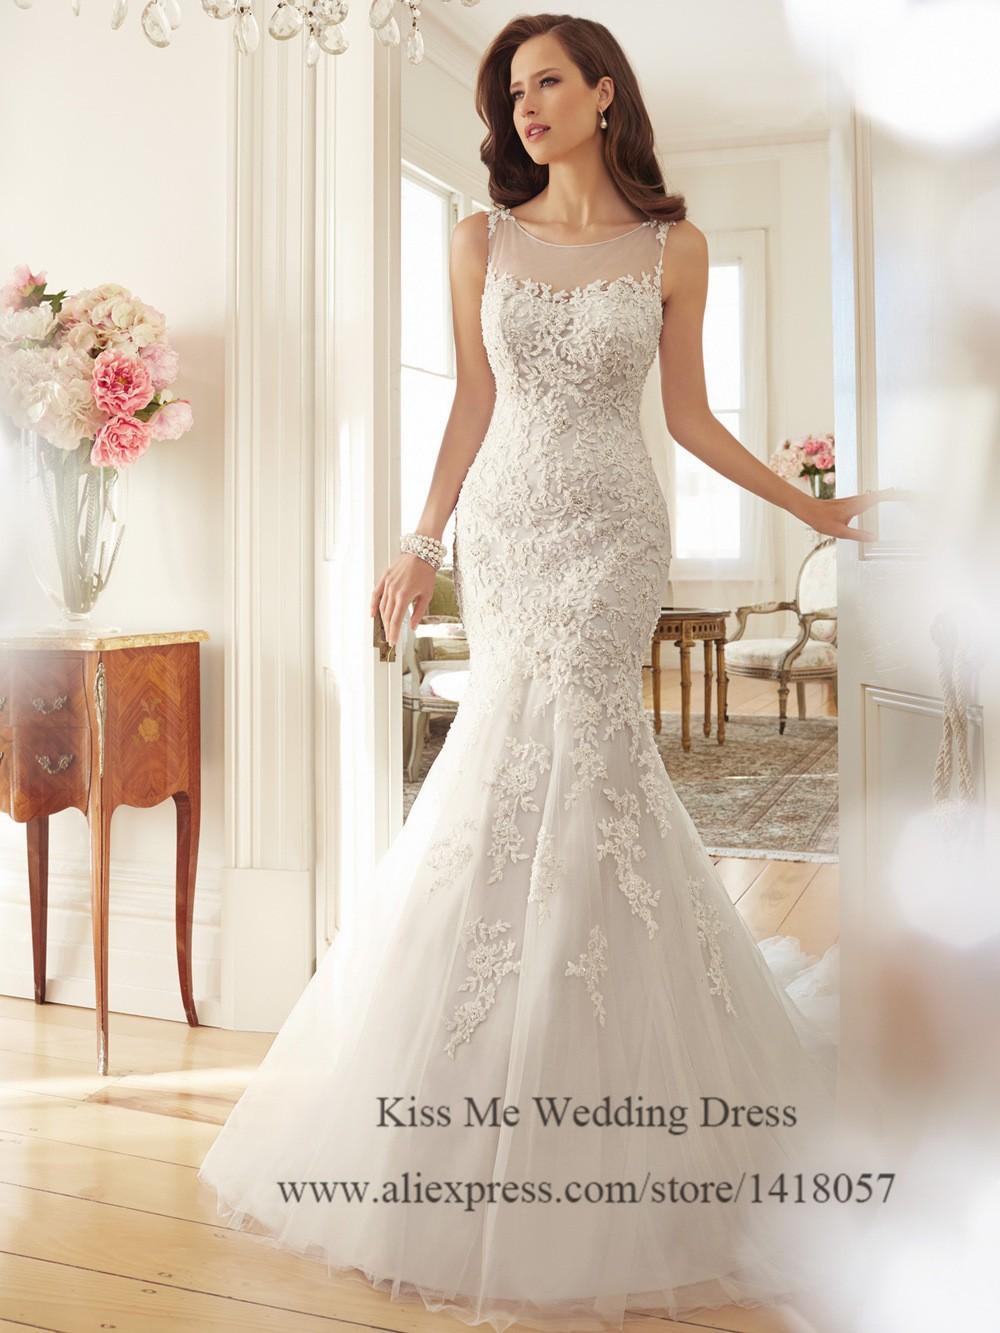 ff6085c6de5f5 Latest Design Lace Wedding Dress 2015 Mermaid Bridal Gowns See ...